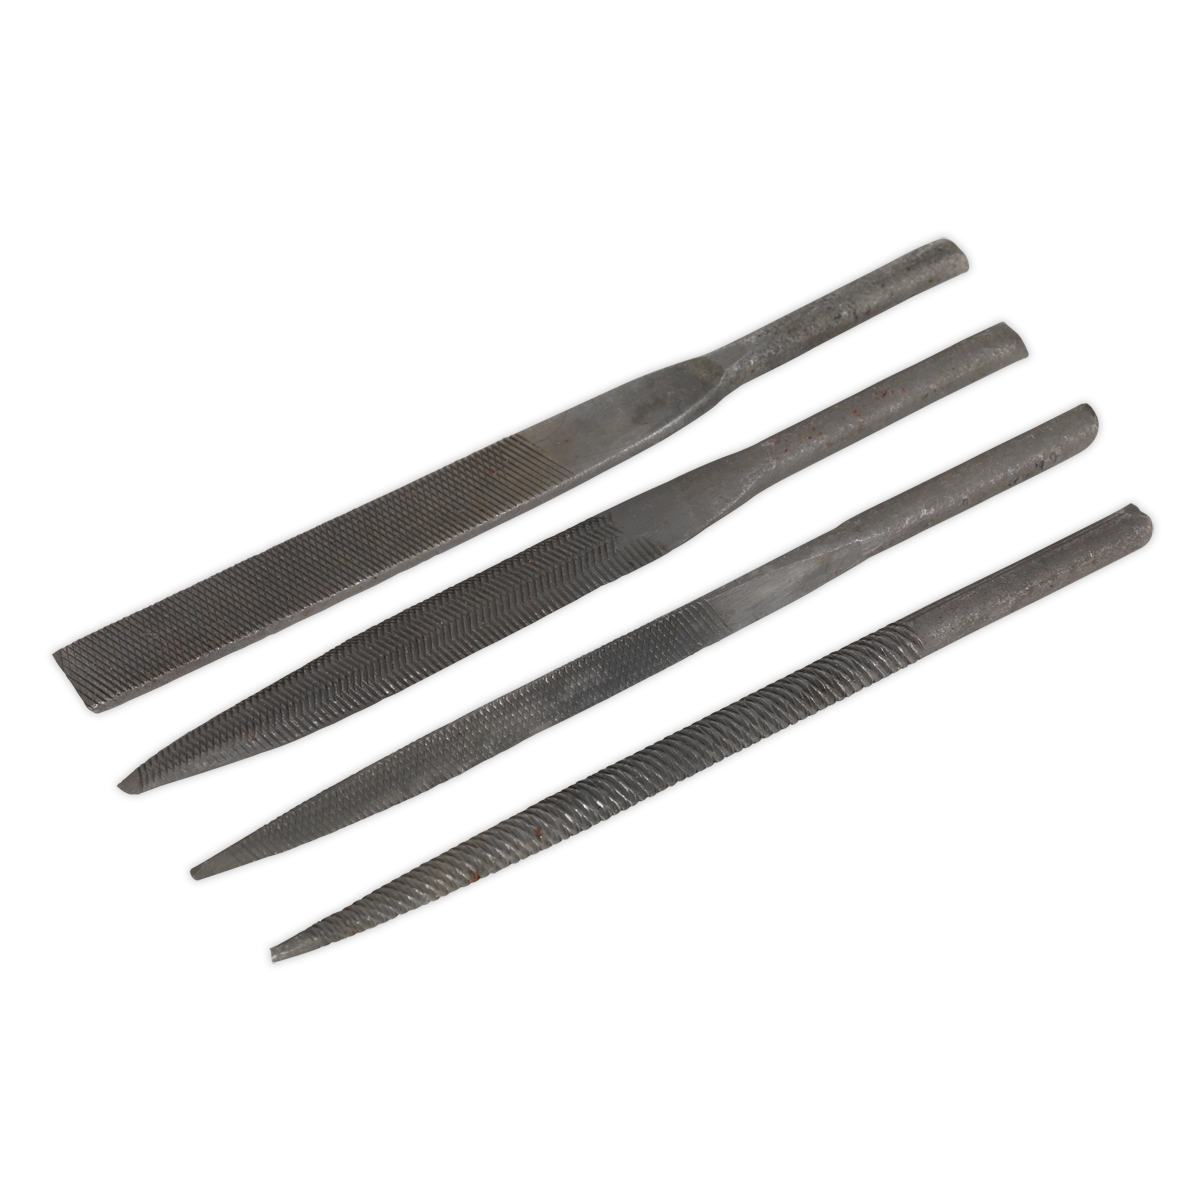 Sealey Needle File Set 4pc for GSA345 GSA345F - 5 YEAR WARRANTY